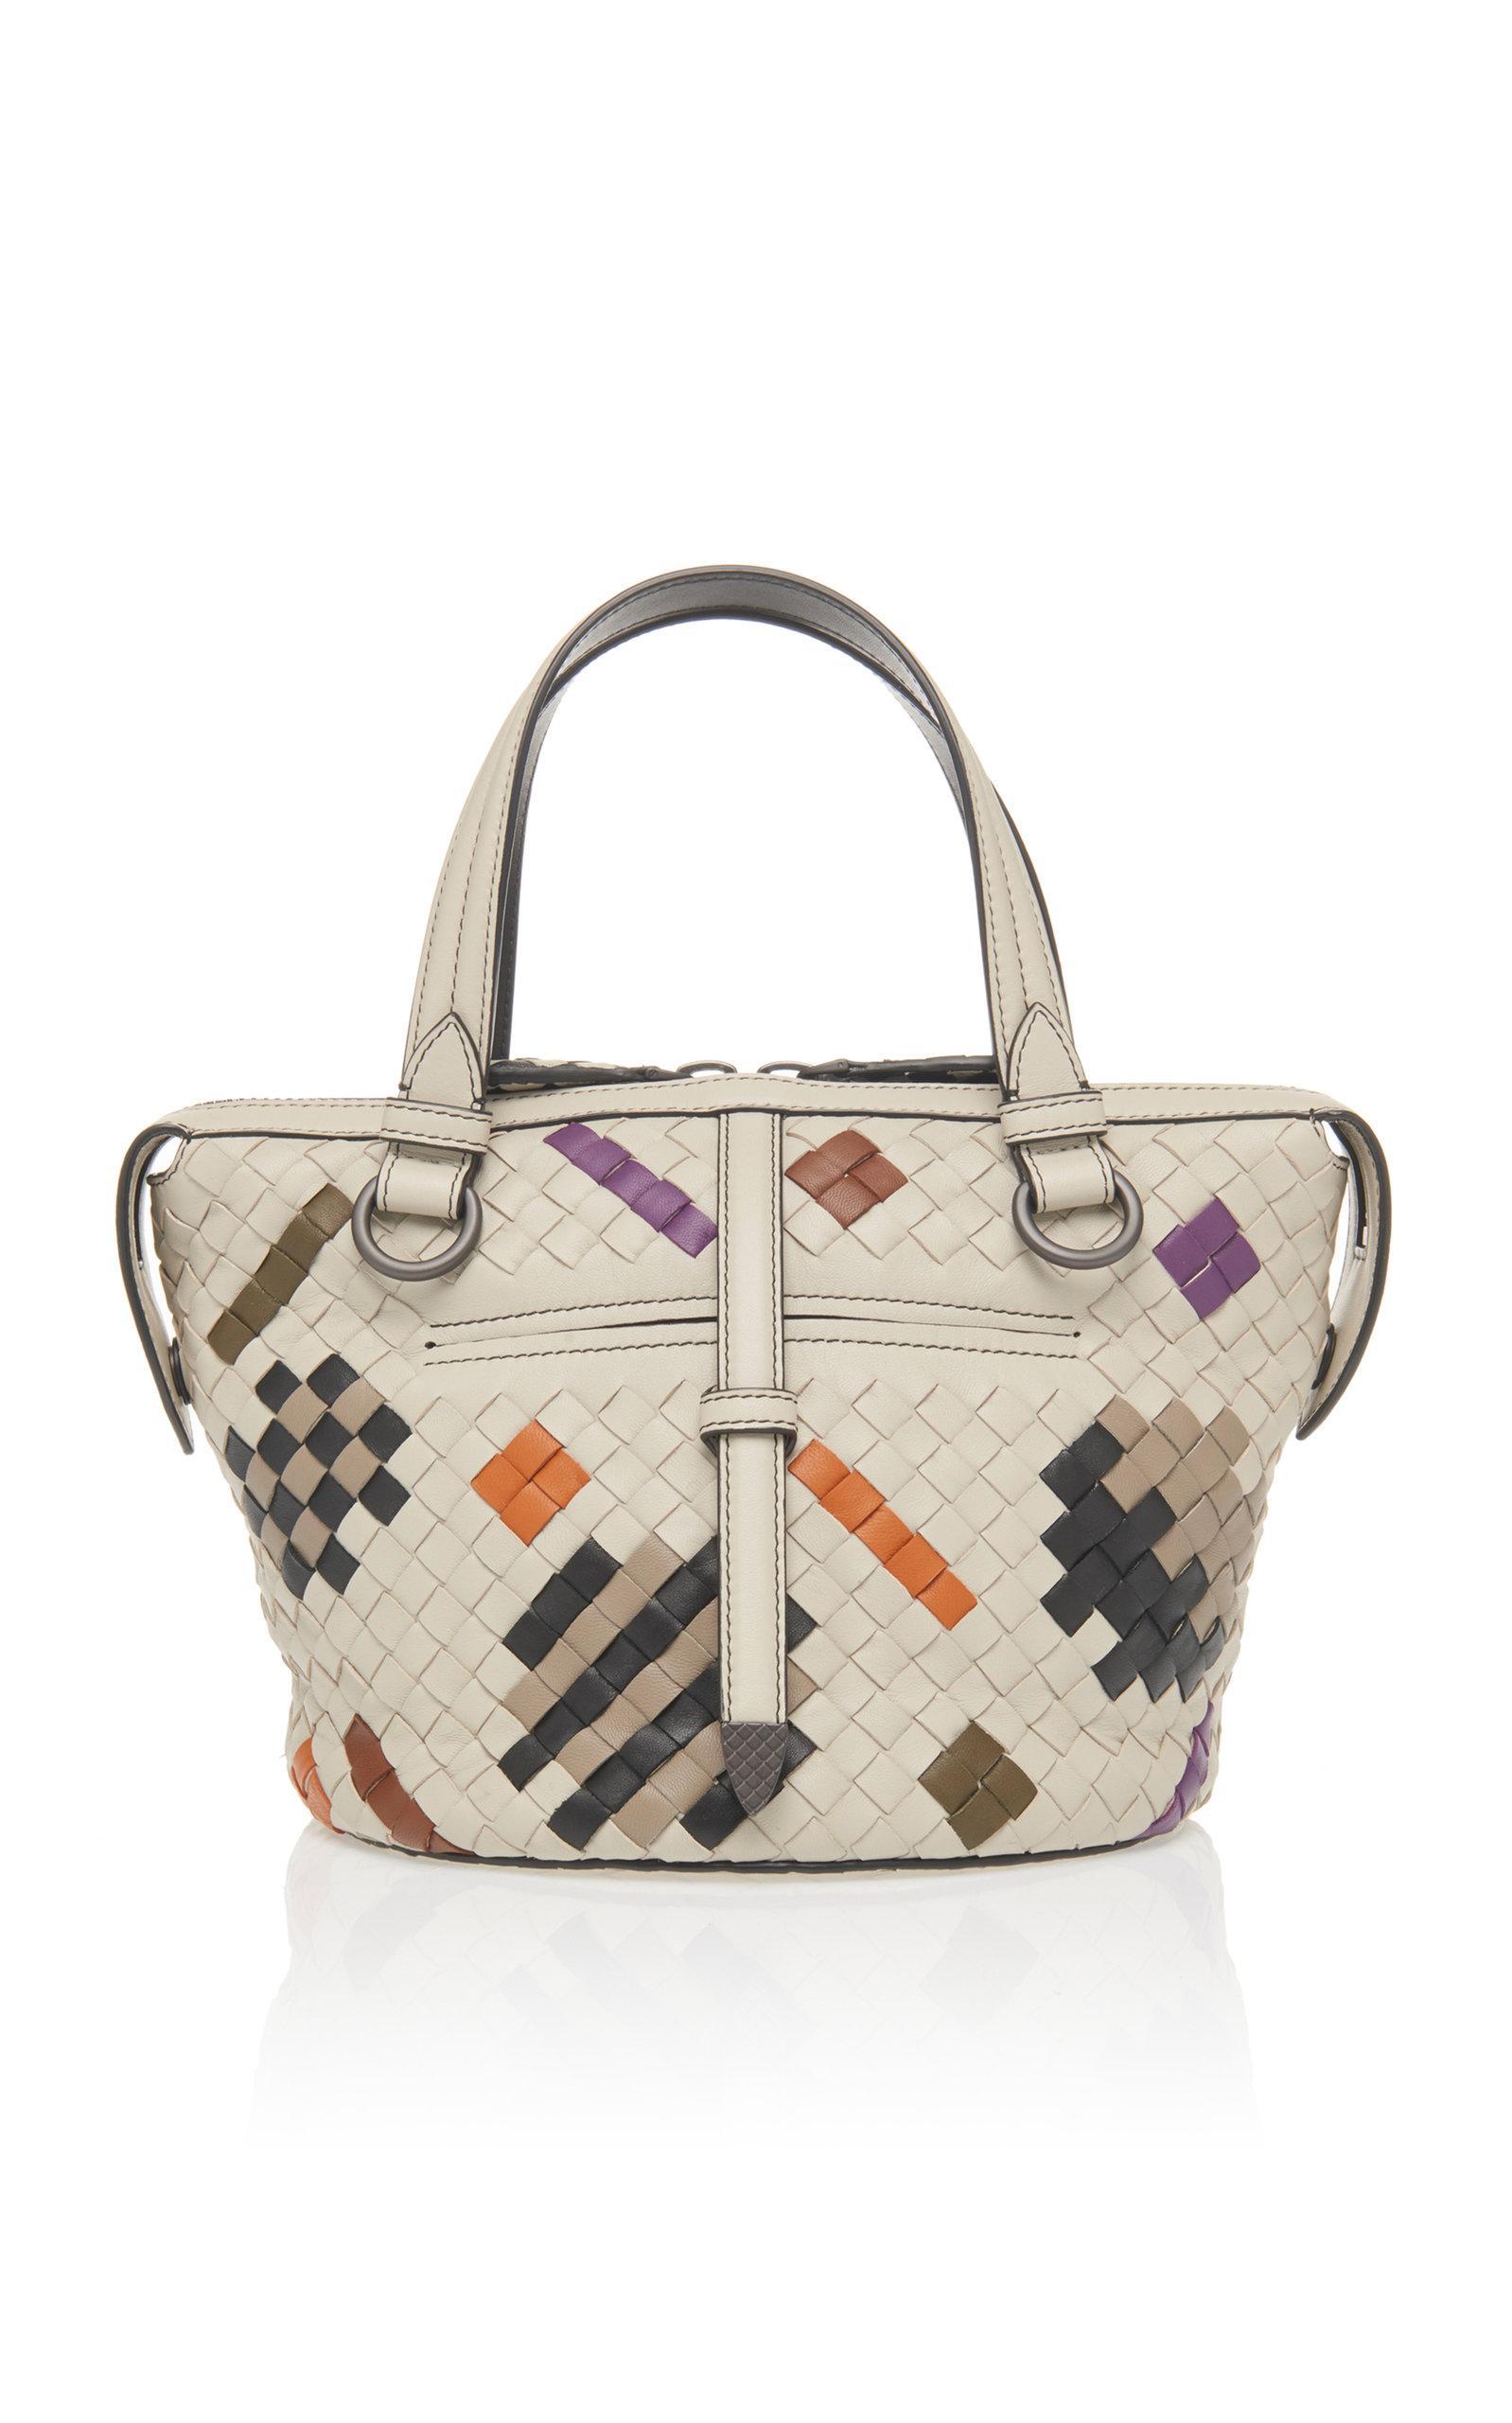 Bottega Veneta Small Tambura Top Handle Bag in White - Lyst 5d79a0ab26b29